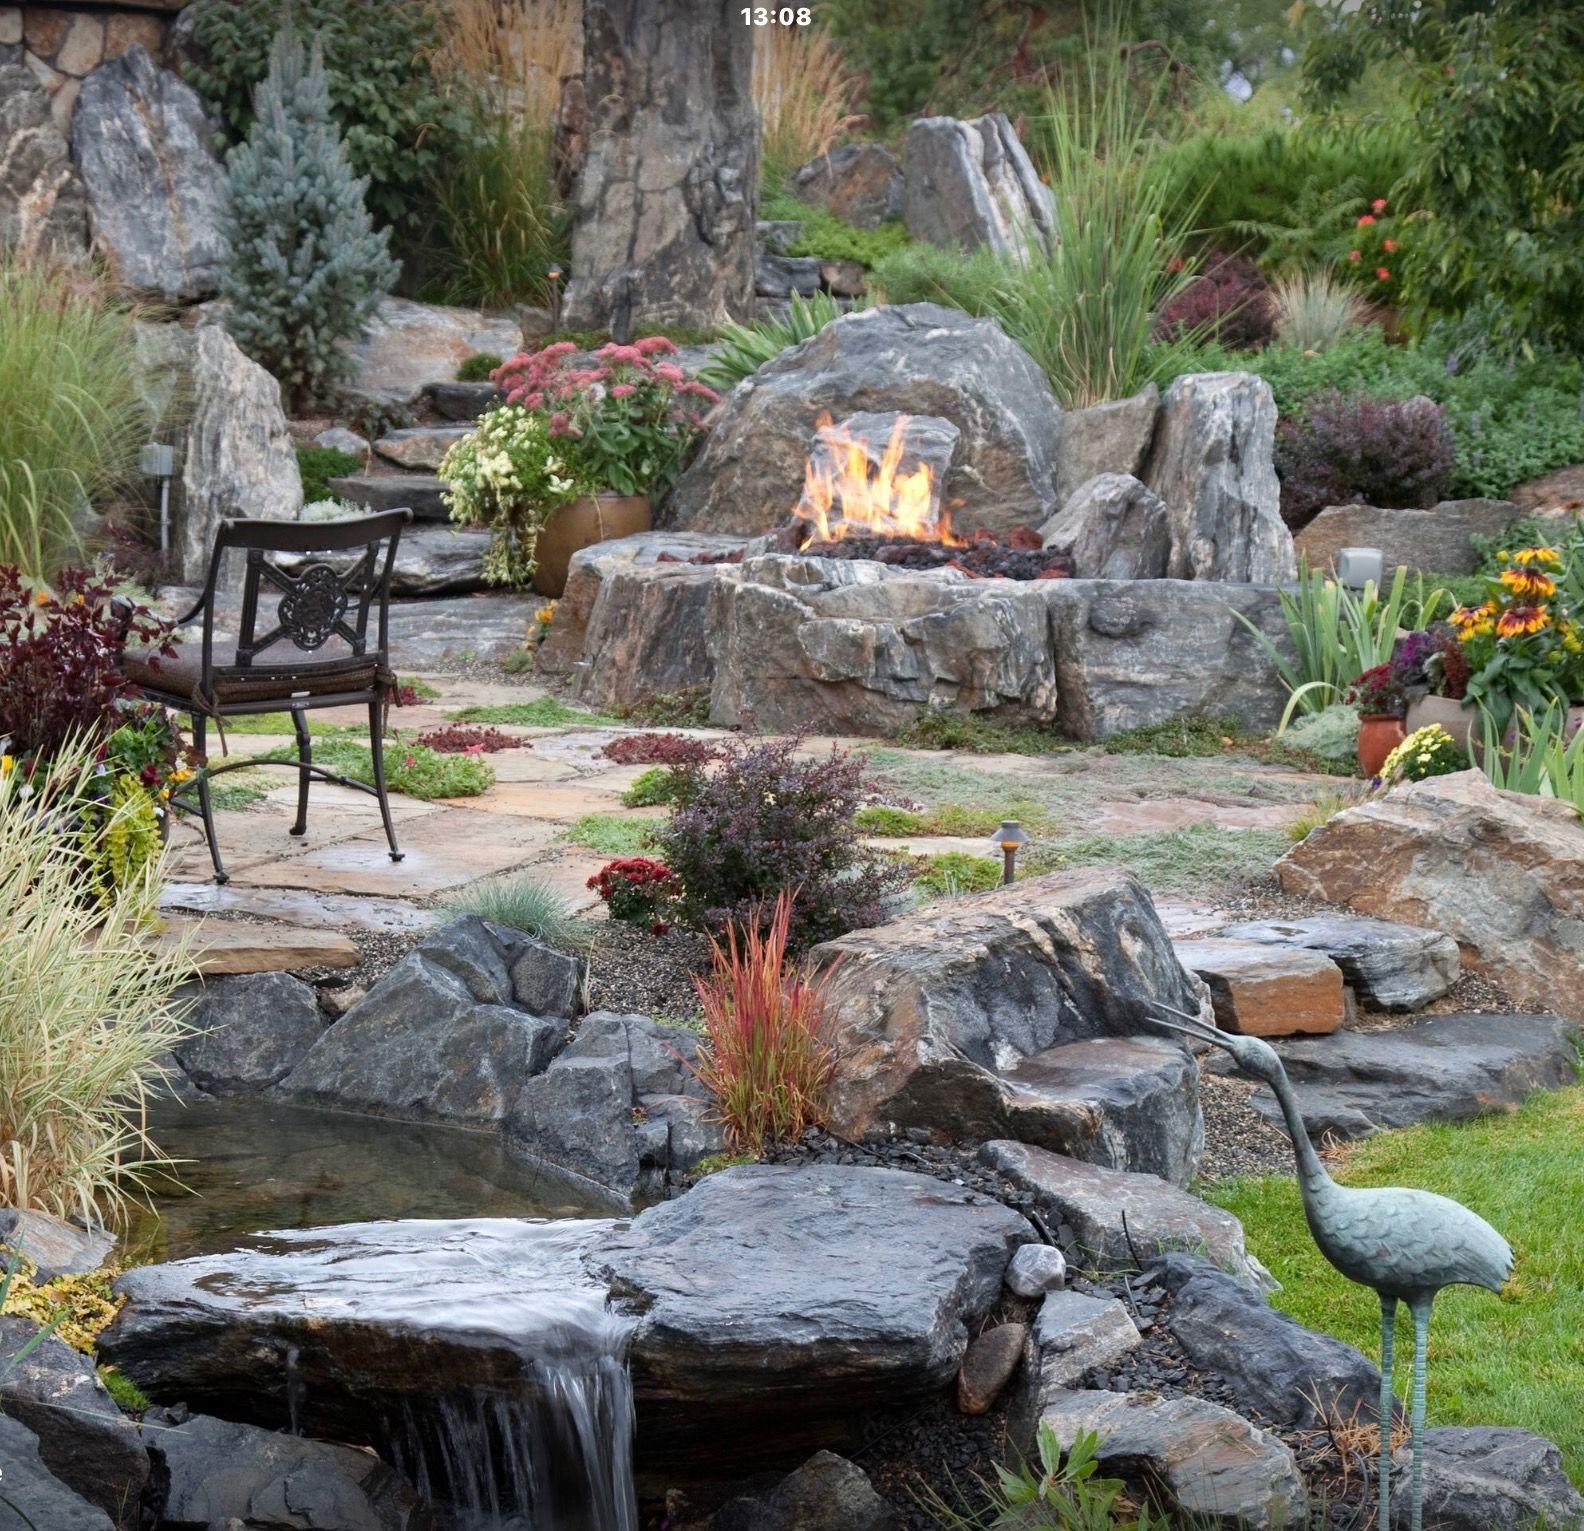 Pin By Sabrina Renee On Garden Dreams!